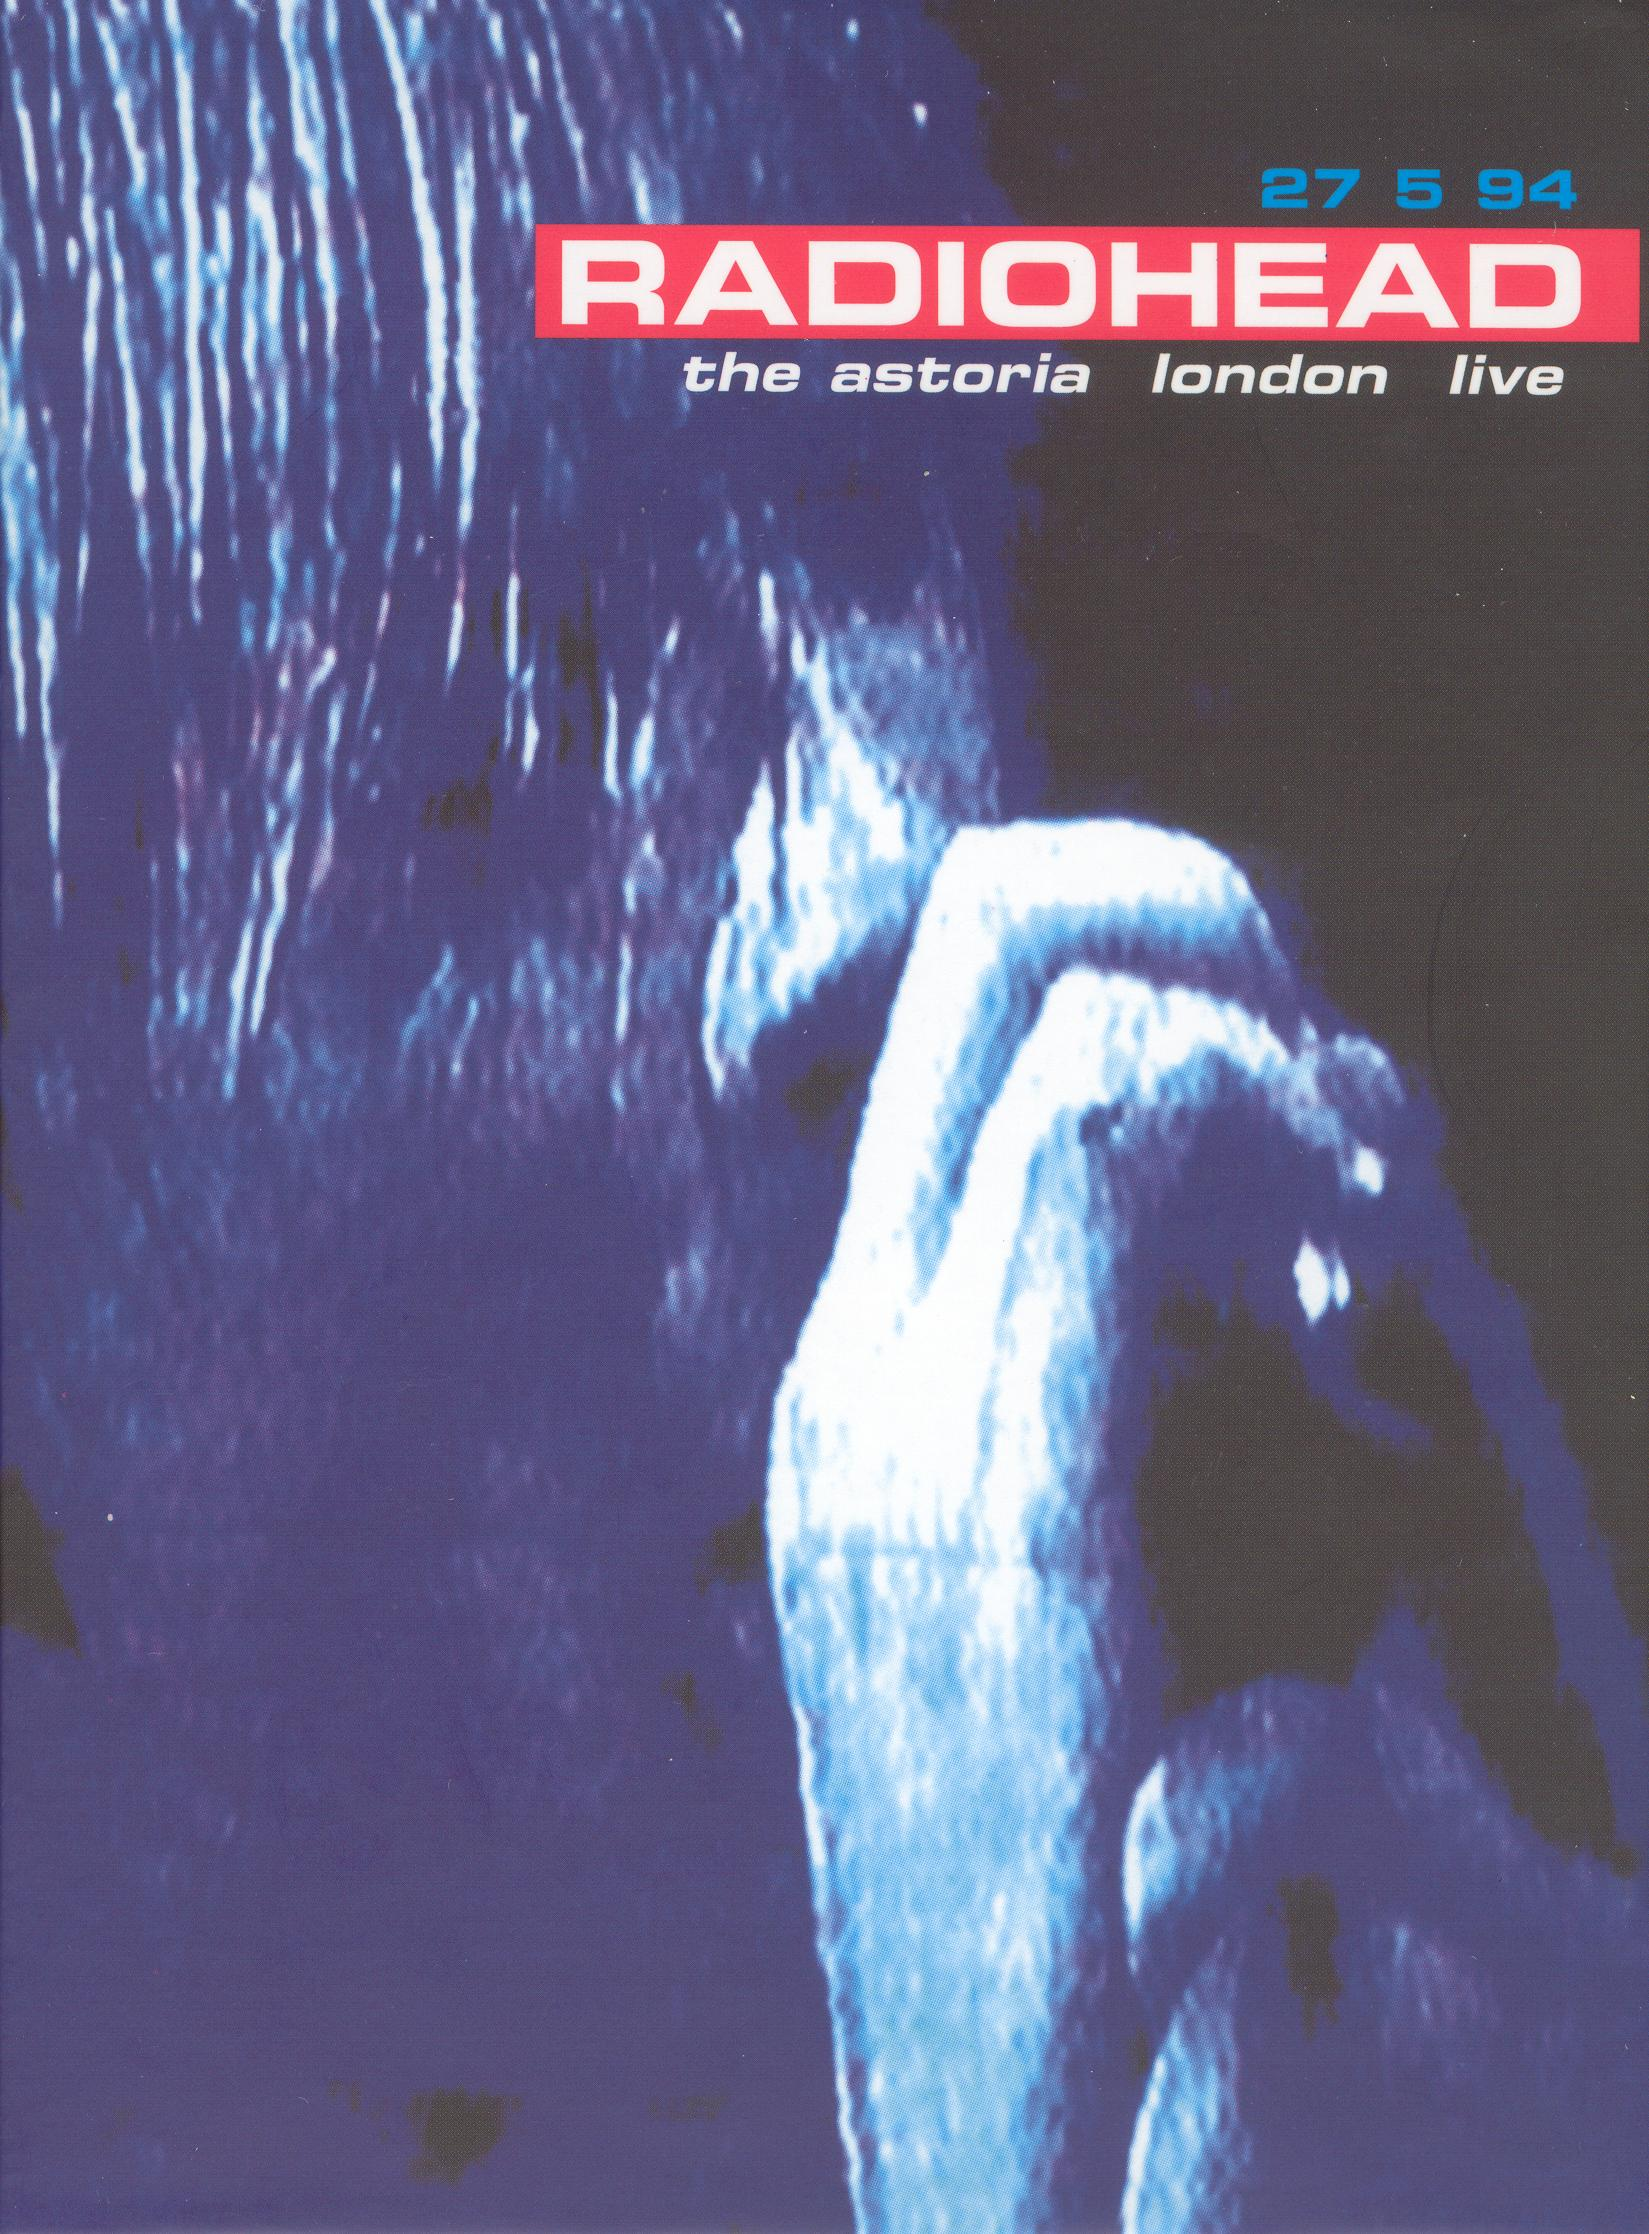 Radiohead: Live At the Astoria